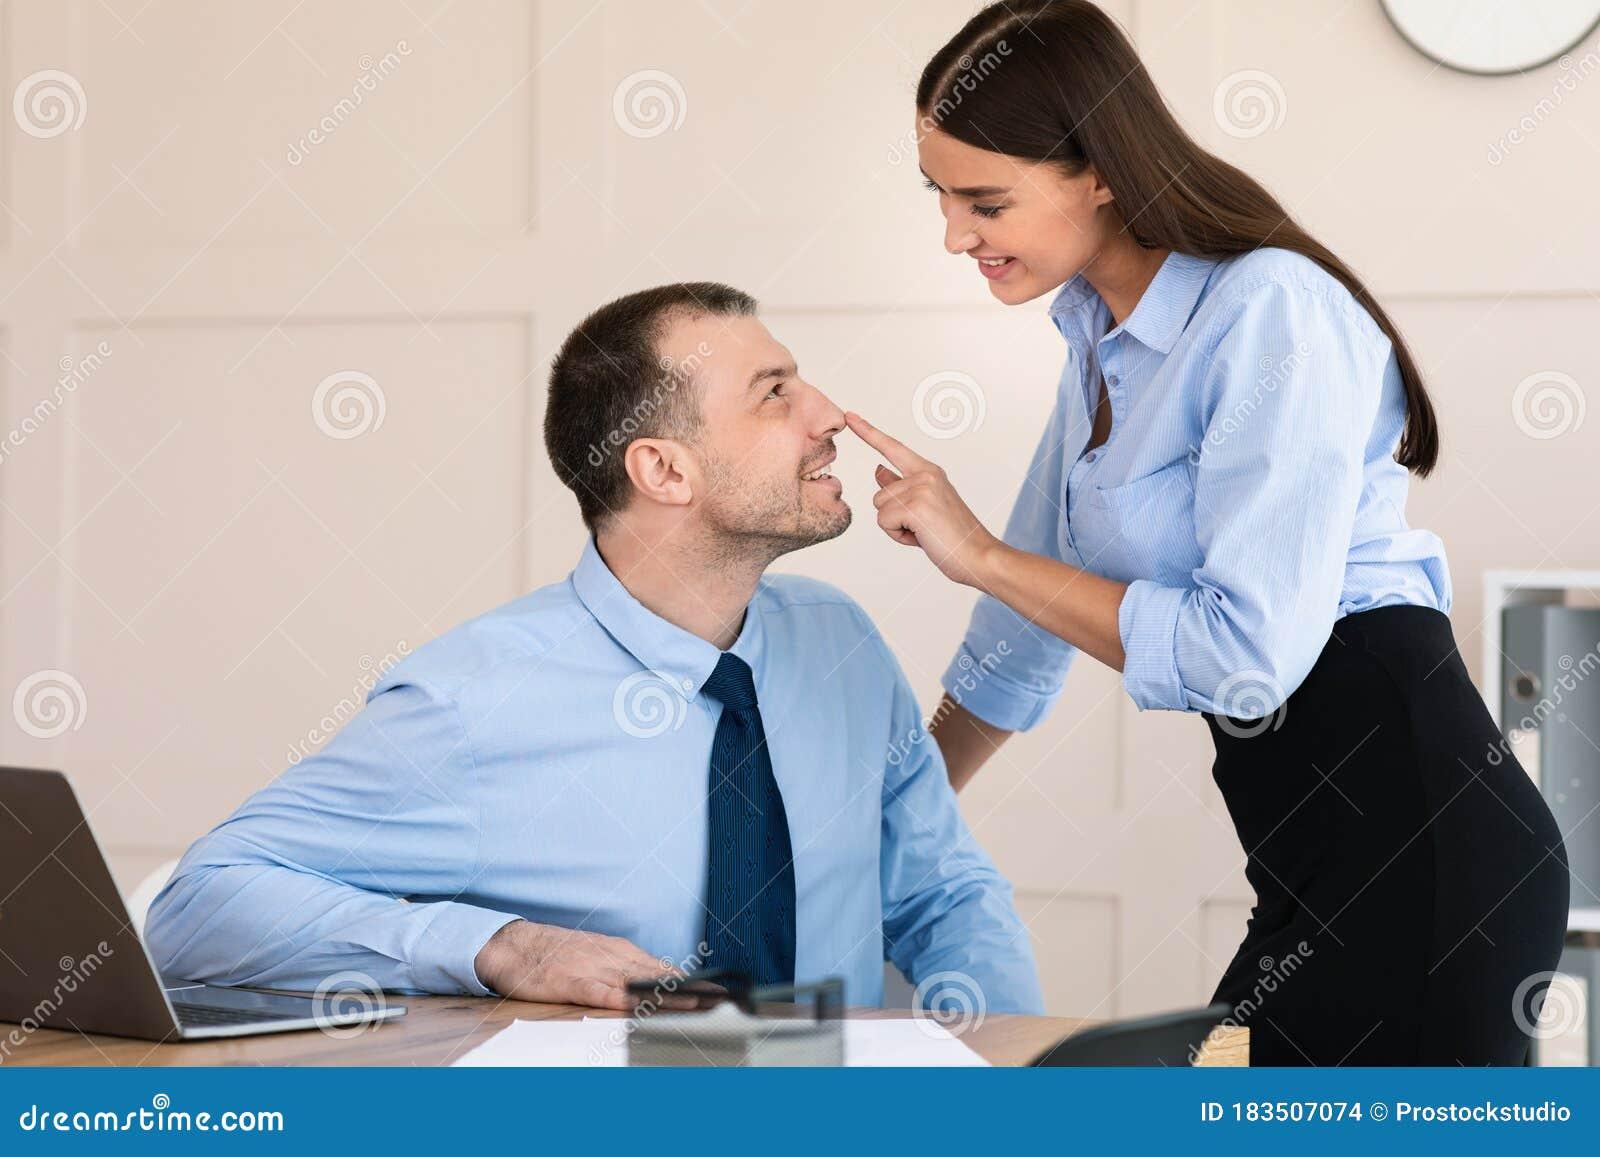 Businesswoman Seducing Male Employee Flirting At Workplace